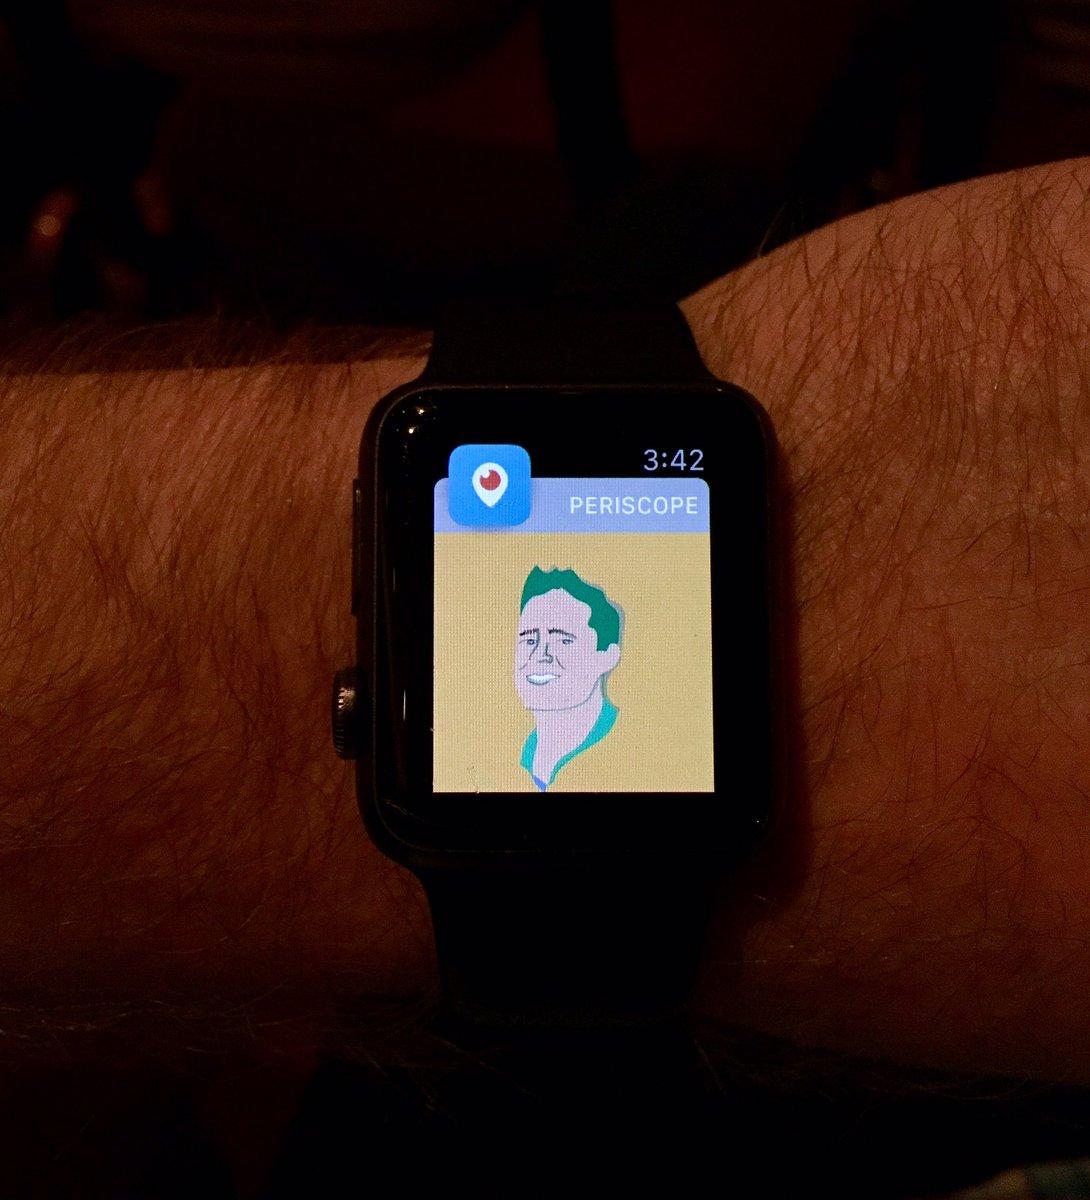 benjaminrobie: My favorite time is Kalen o'clock. #realmagento #Magentoimagine https://t.co/87mYoQyjAj